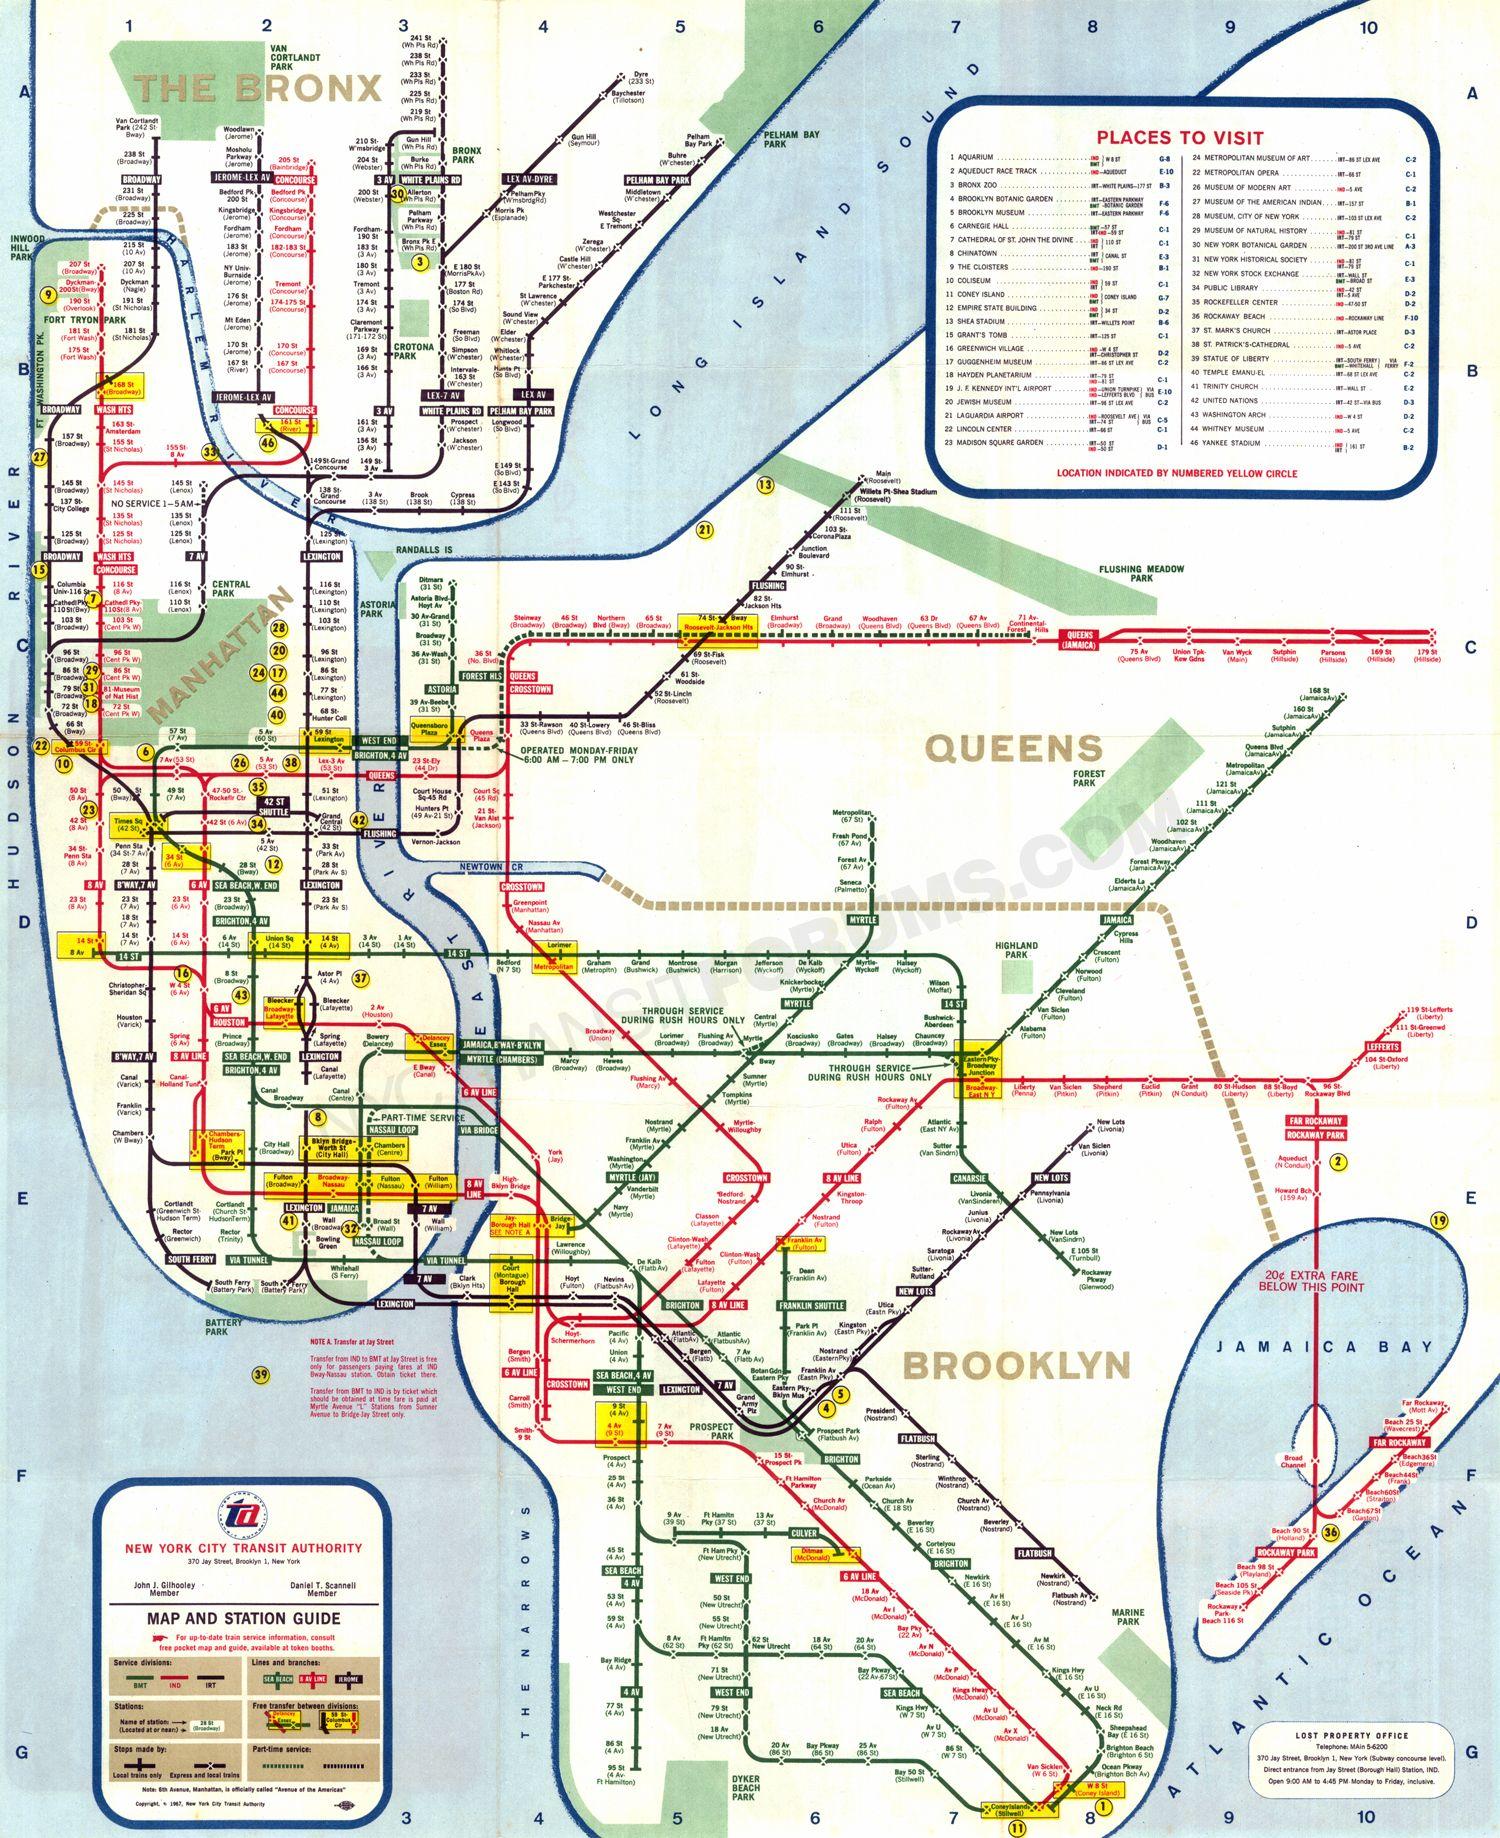 1967 new york city transit authority subway map httpwwwnyctransitforums